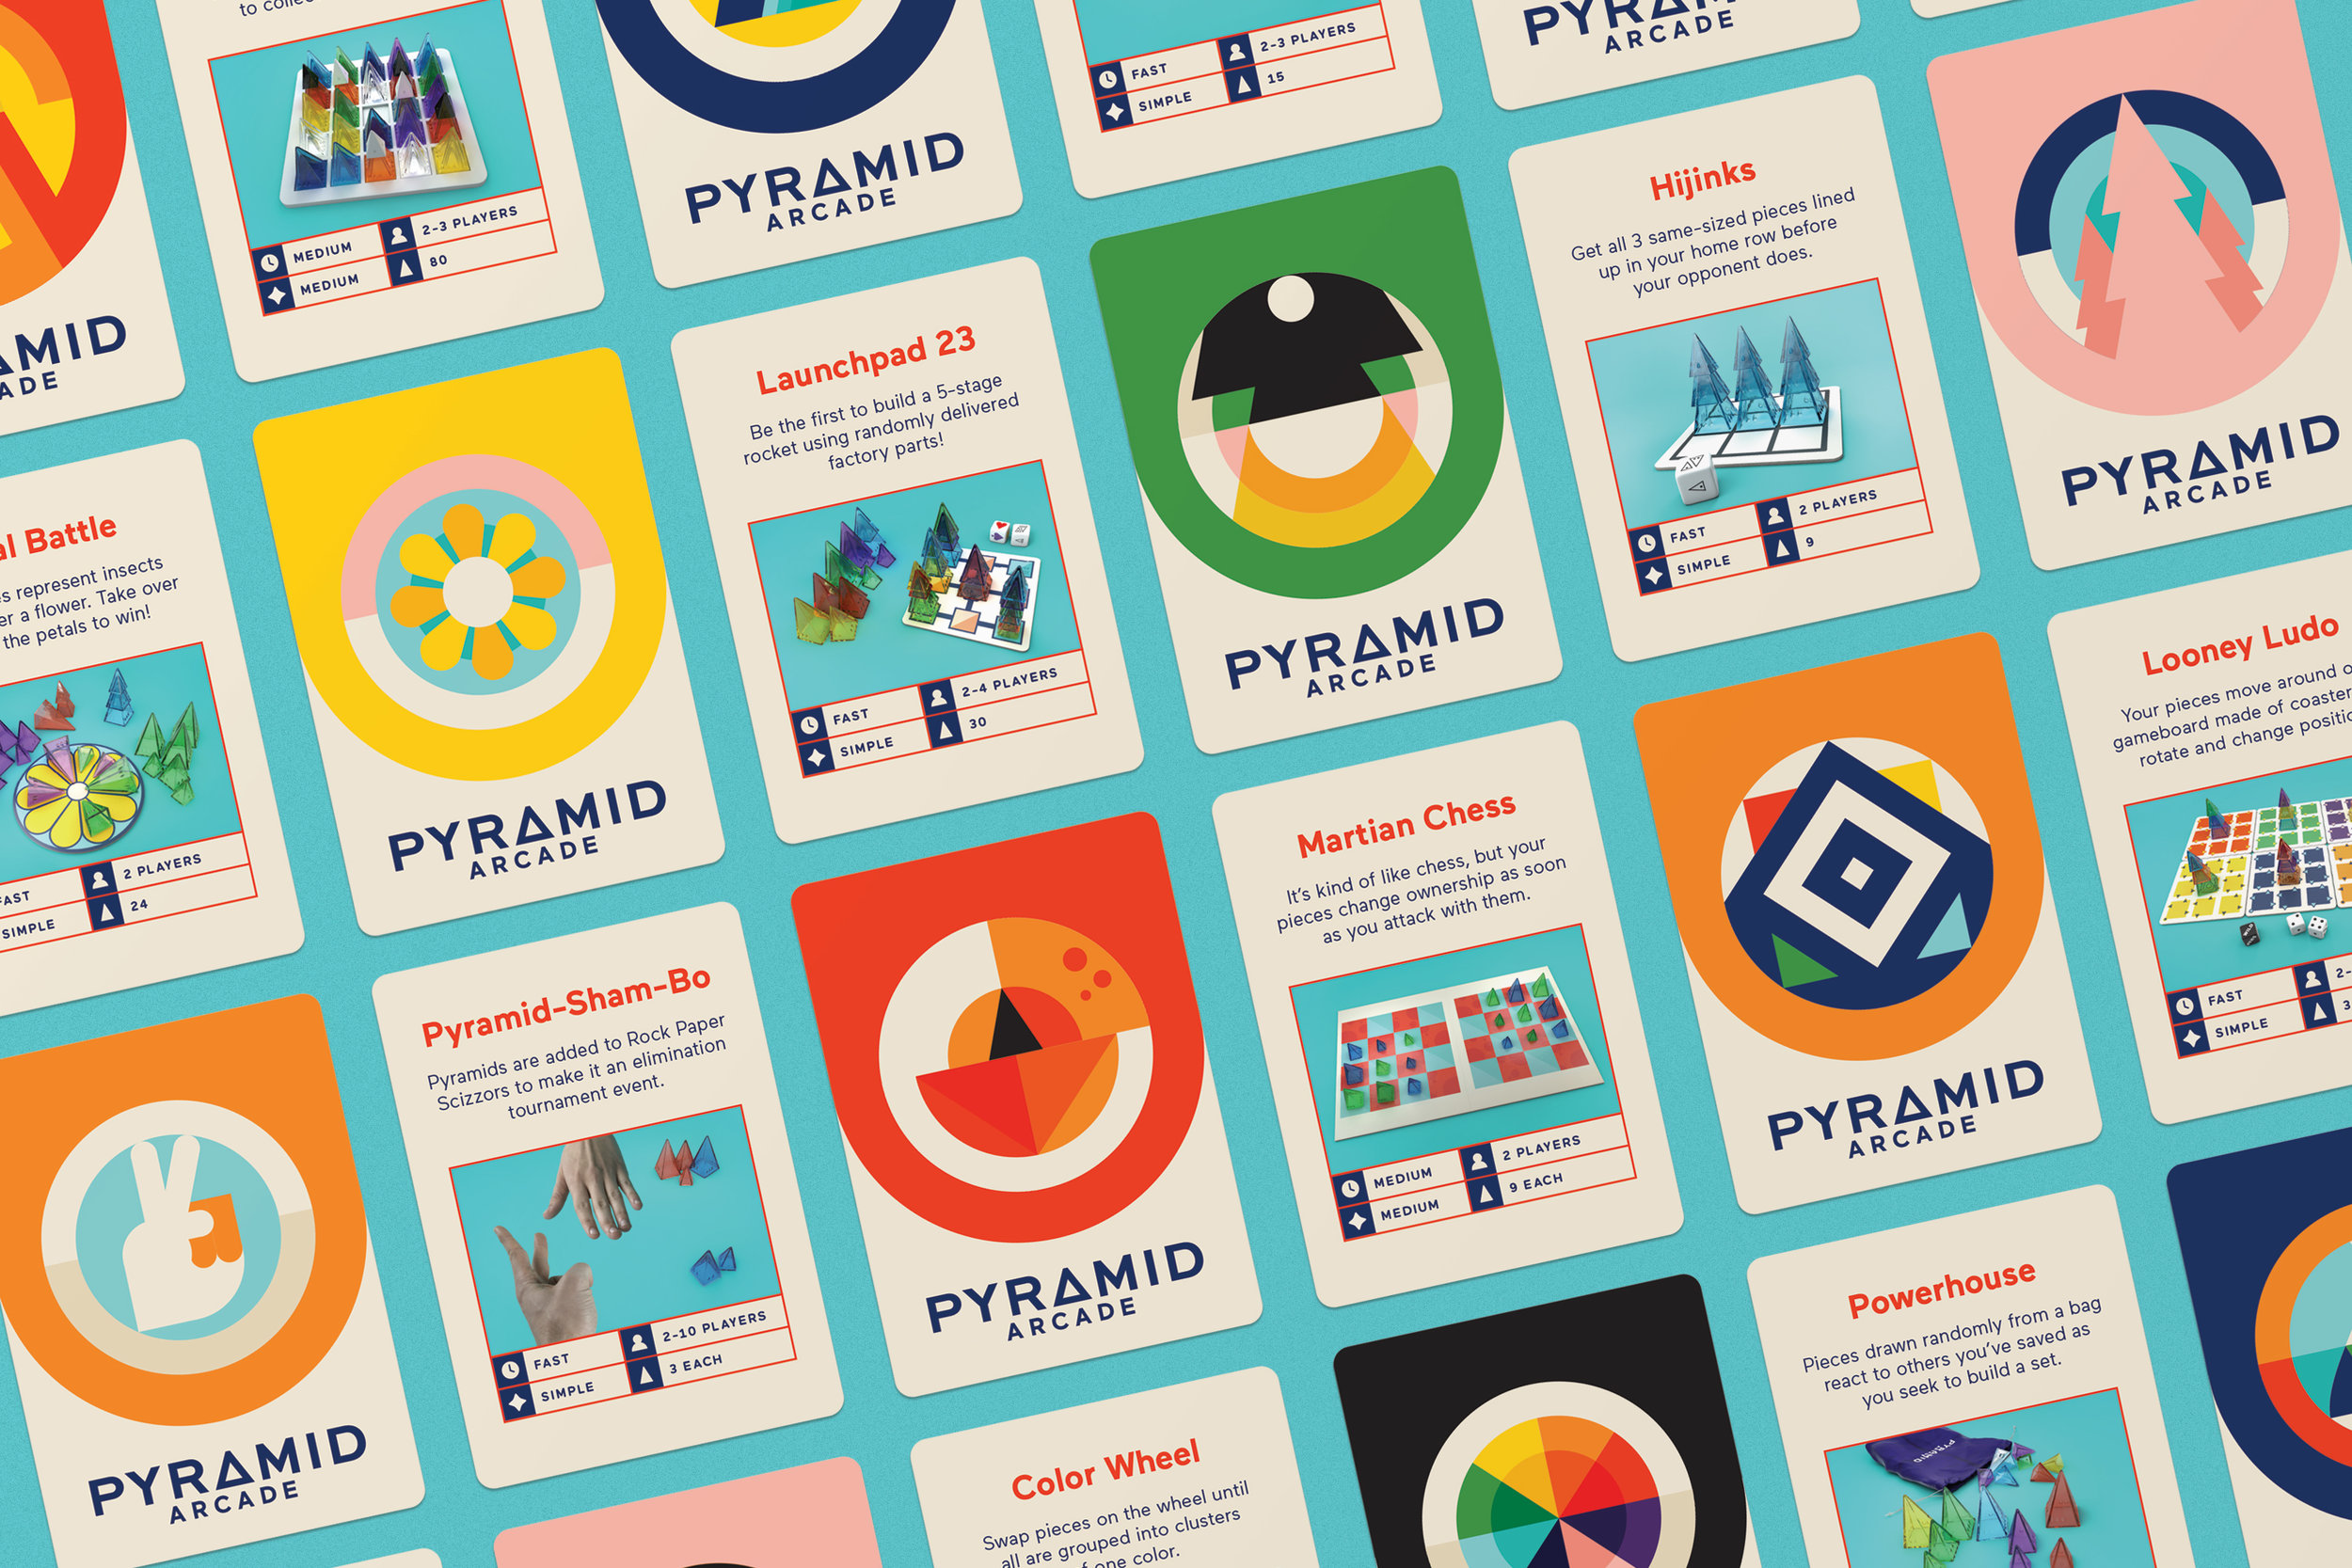 Pyramid Arcade cards